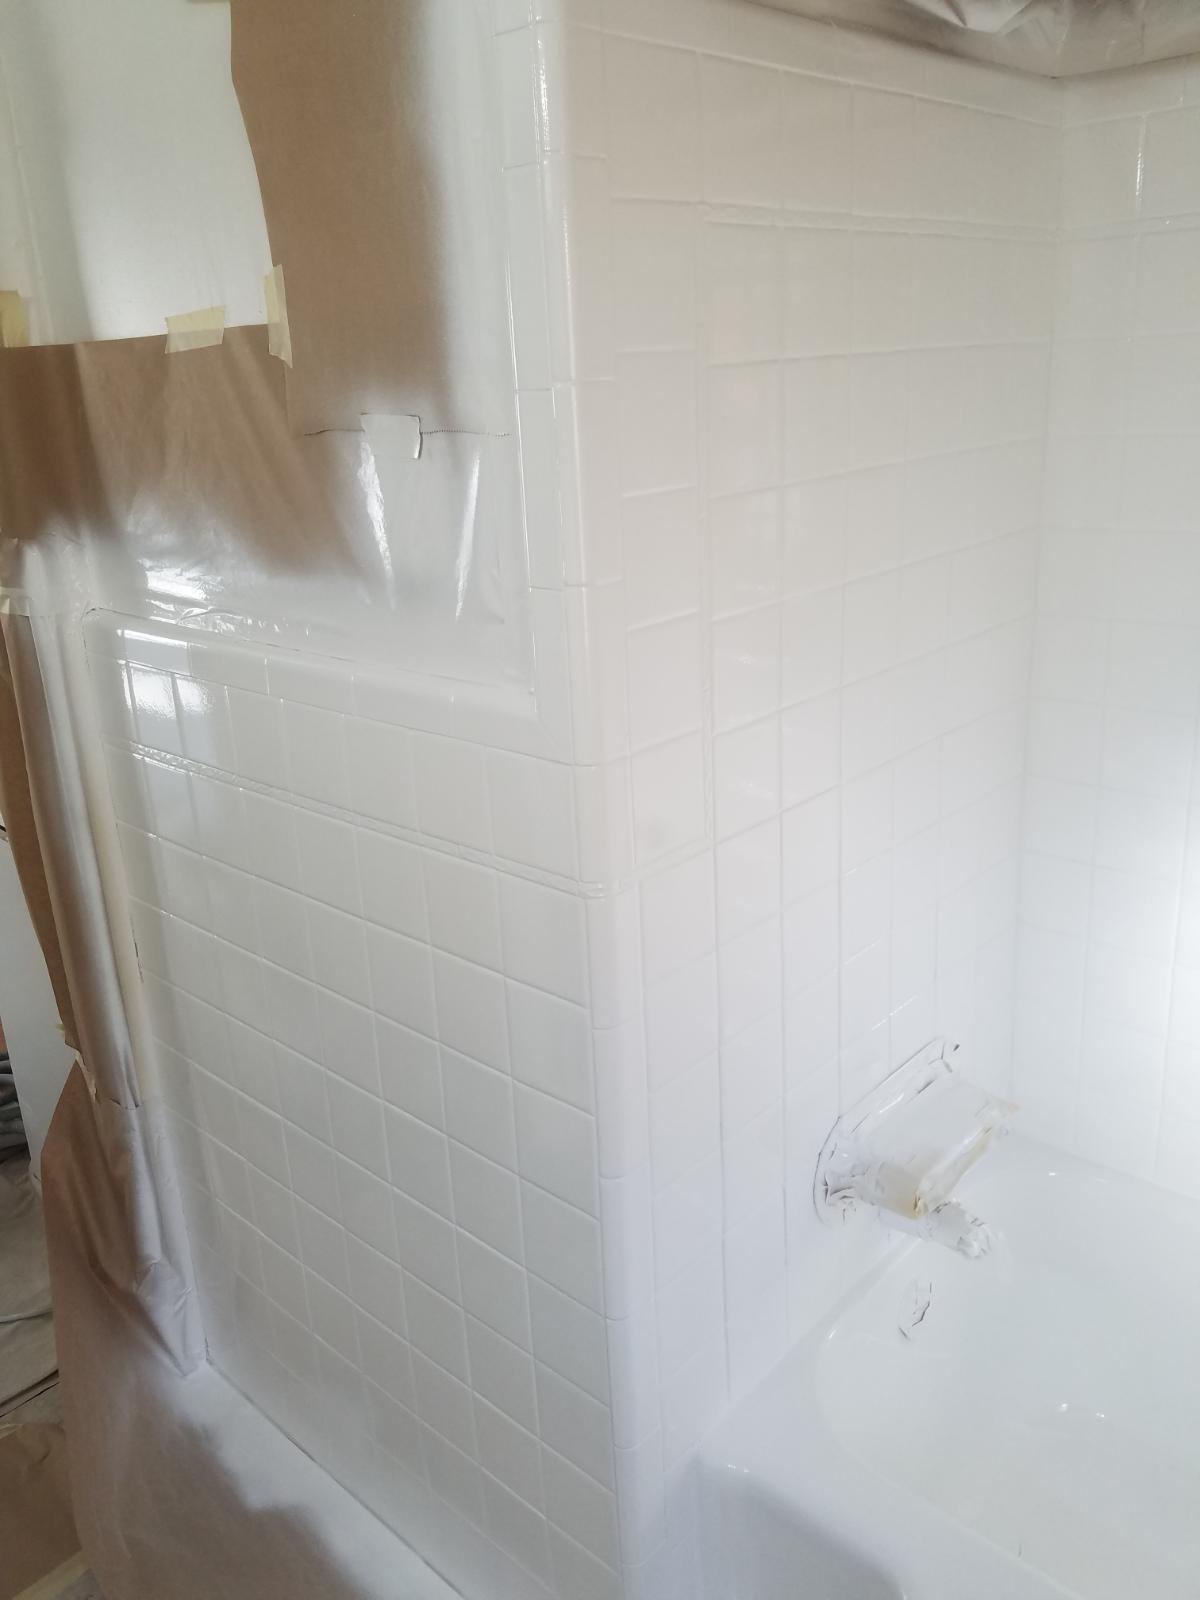 The Liquid Porcelain Tub and Tile Rejuvenation System Shows 1